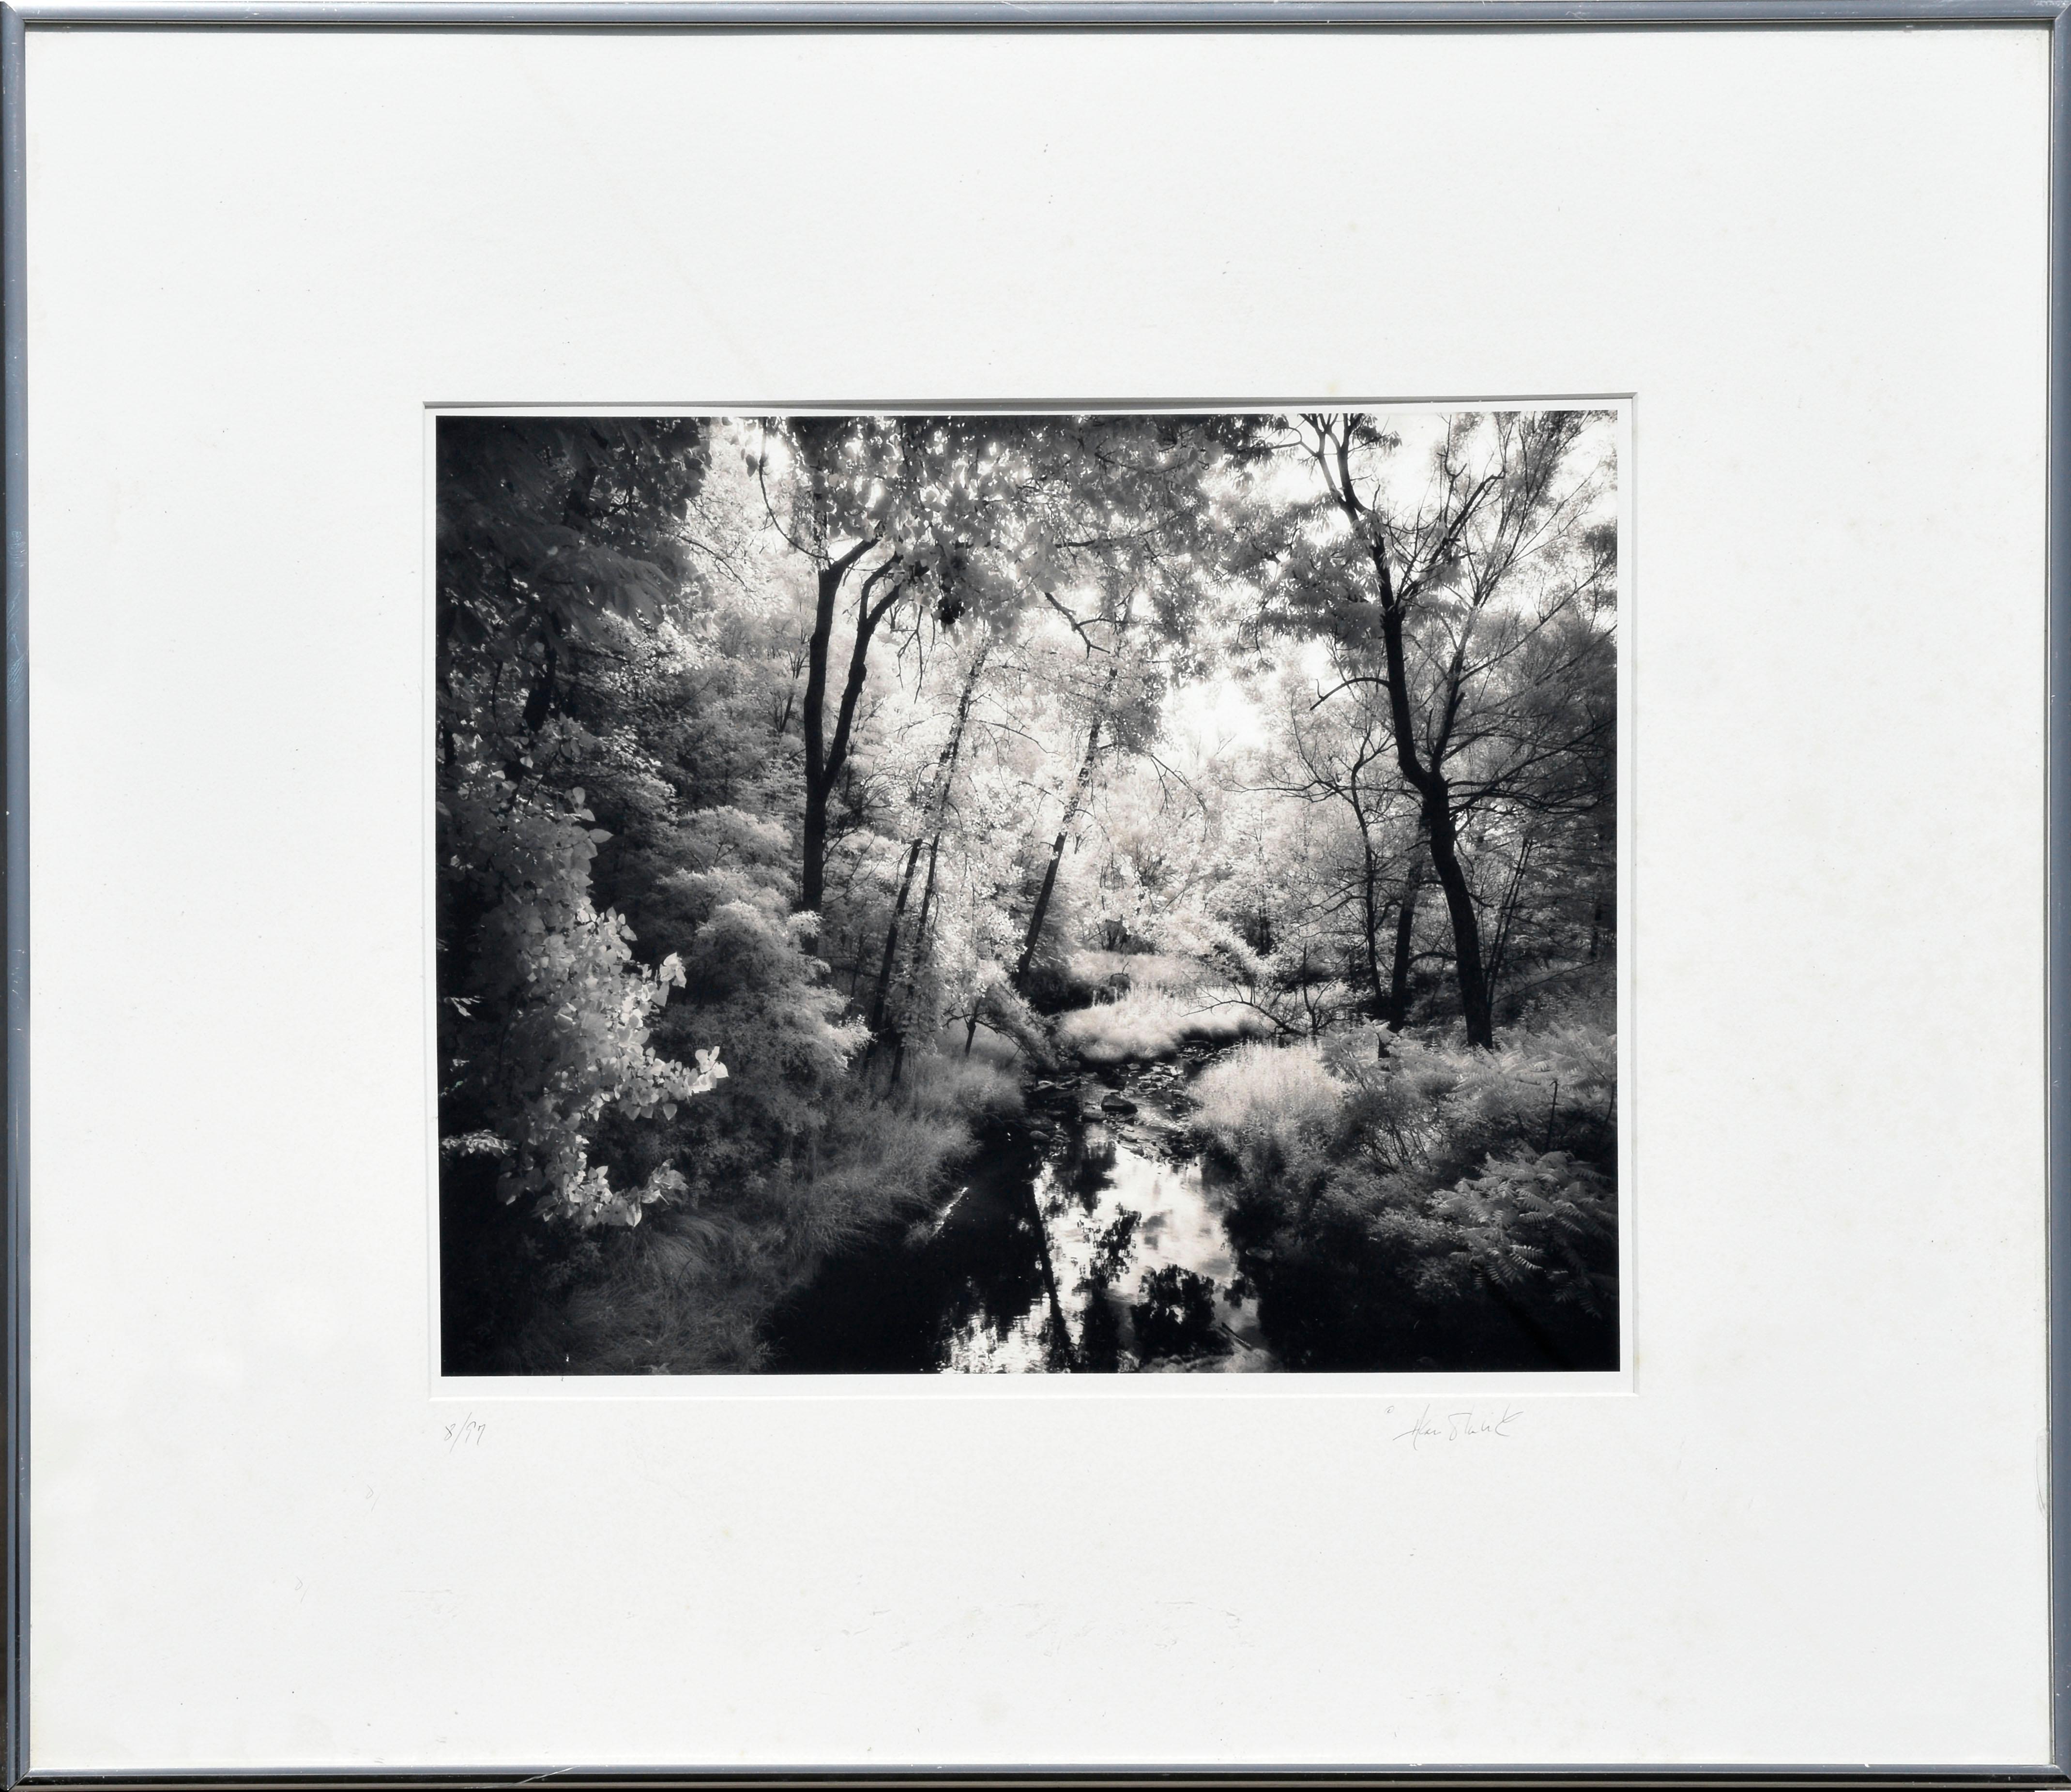 Saratoga Battlefield Creek - Signed Black & White Landscape Photograph